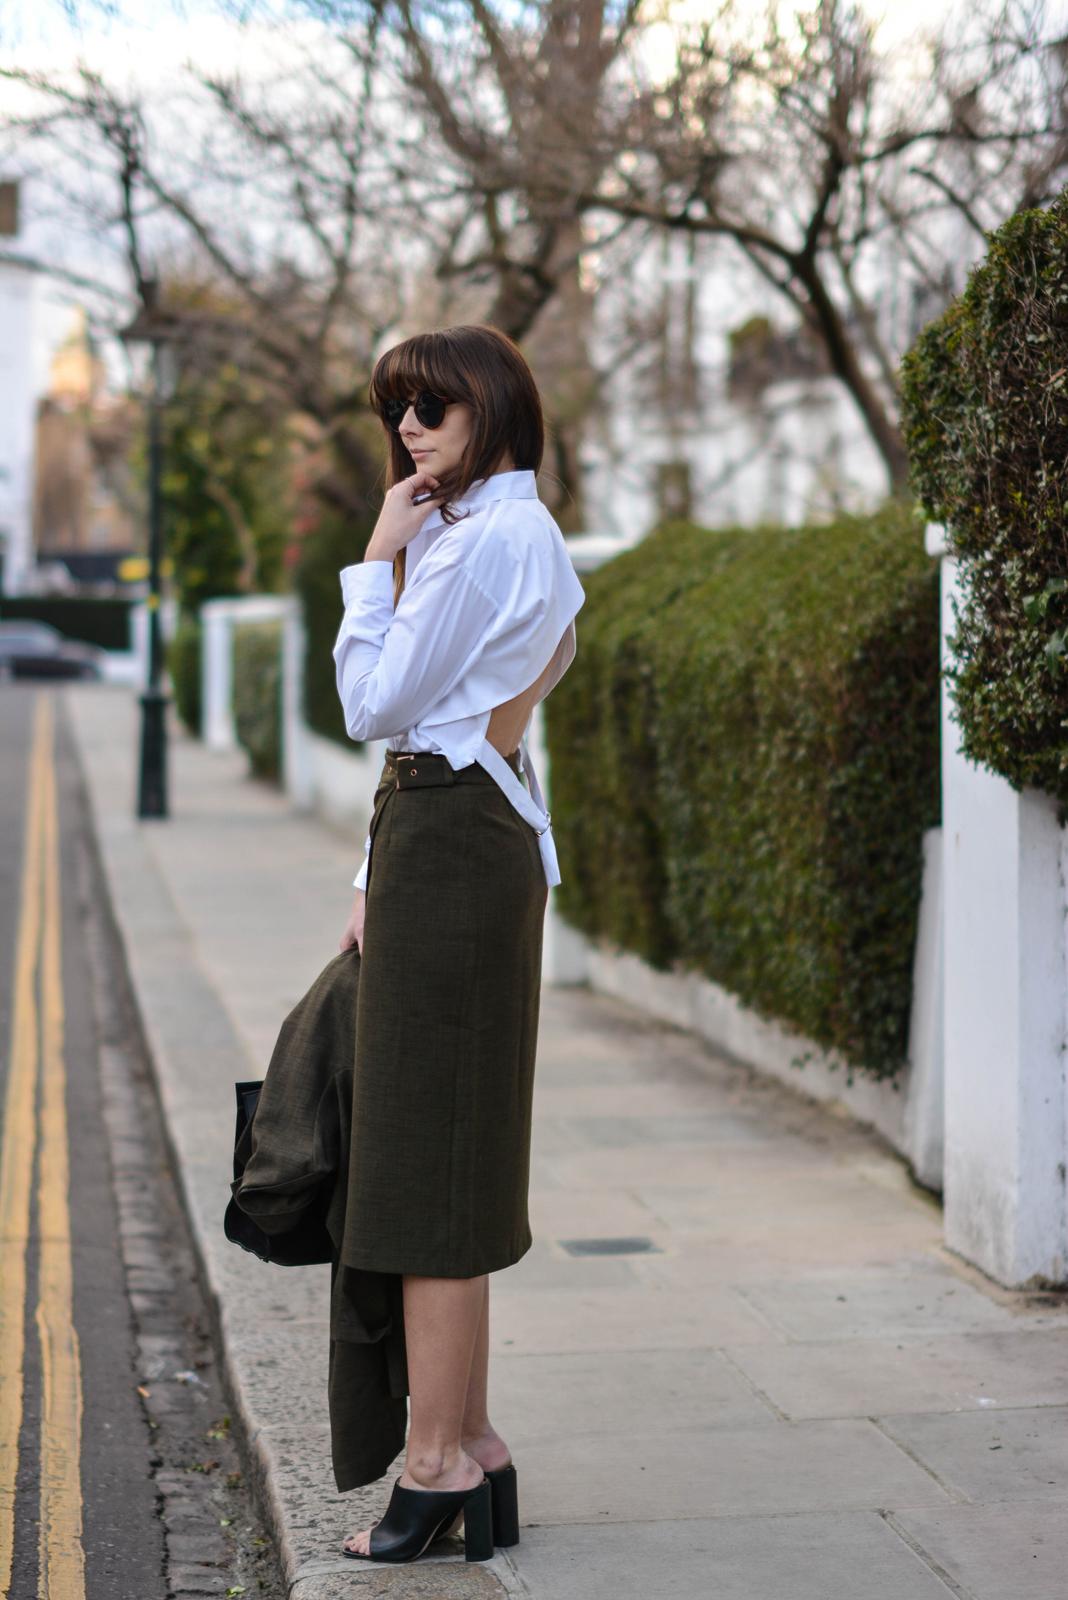 EJSTYLE - Emma Hill, London street style LFW, Khaki asos coord, asos khaki long jacket, asos khaki wrap skirt, asos white backless shirt, Zara mules, Jimmy Choo Riley bag